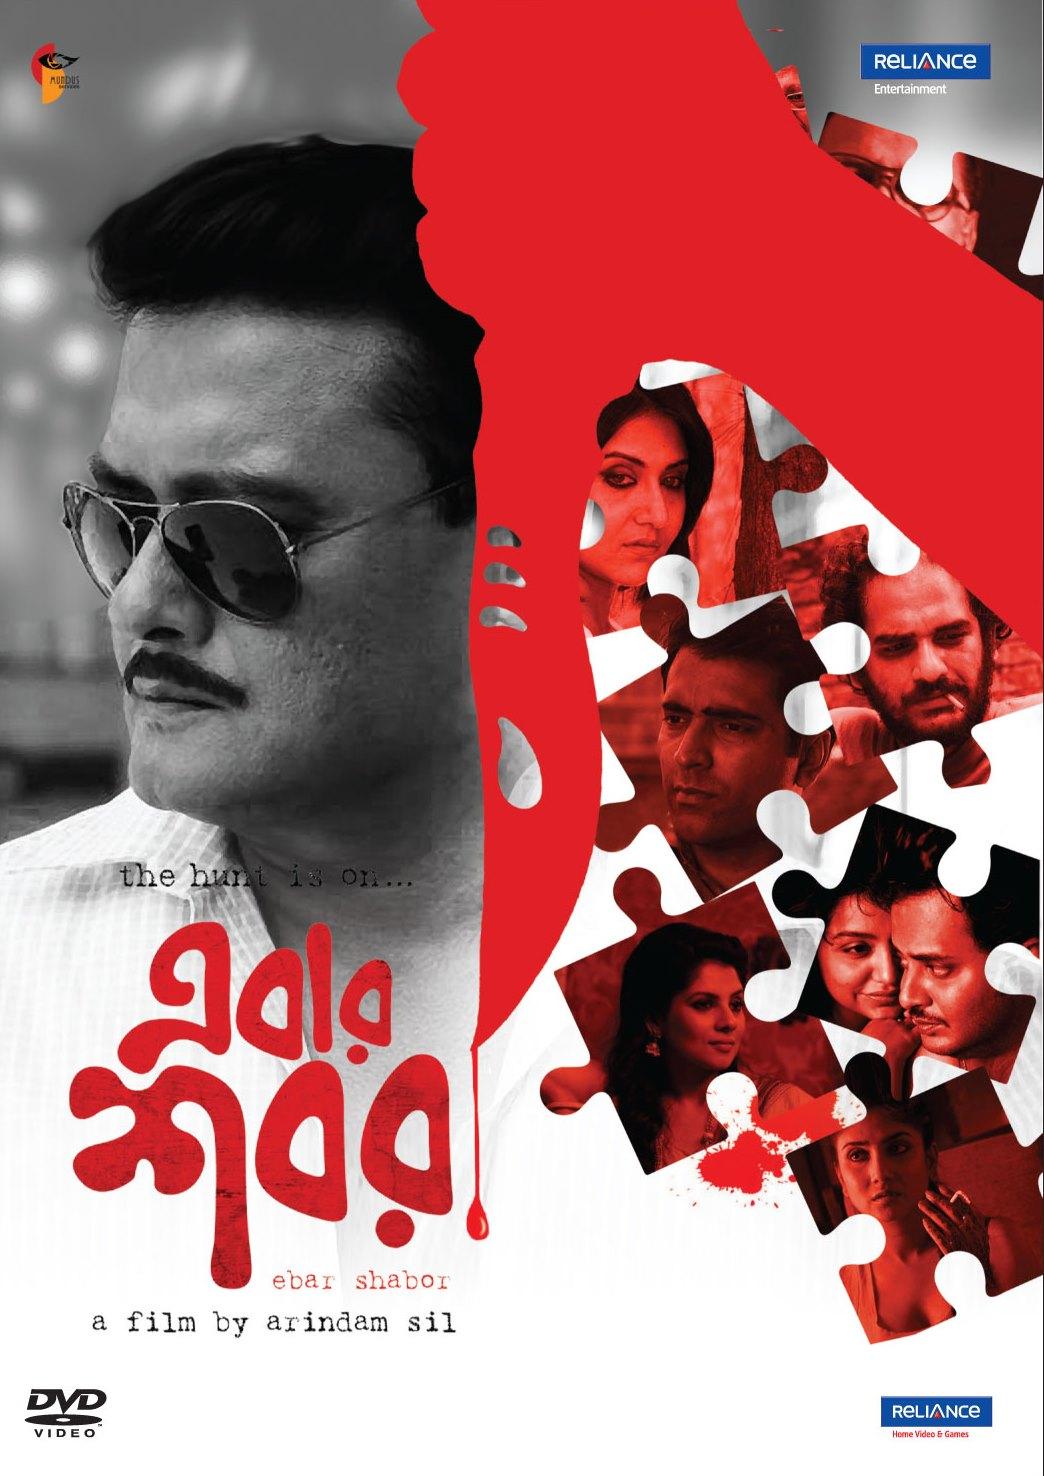 Ebar Shabor 2015 Bengali Movie 720p HEVC HDRip 550MB